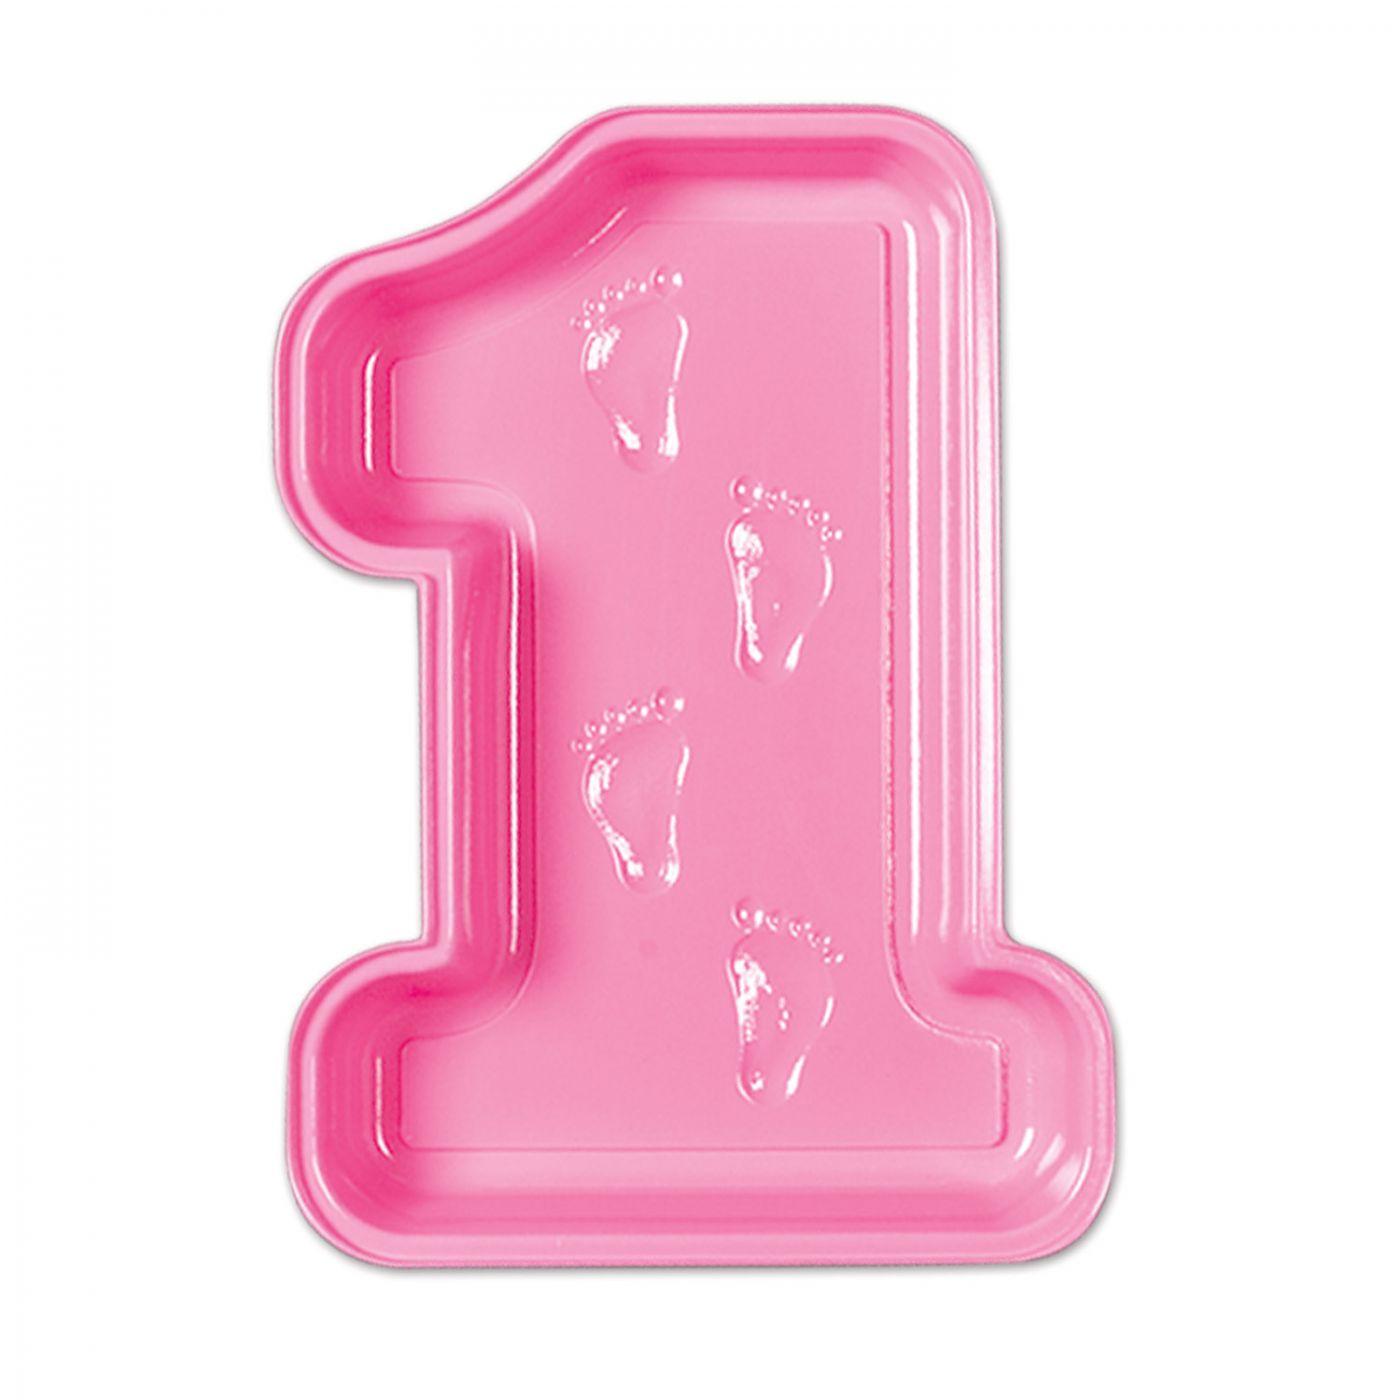 Plastic Baby's 1st Birthday Tray (24) image